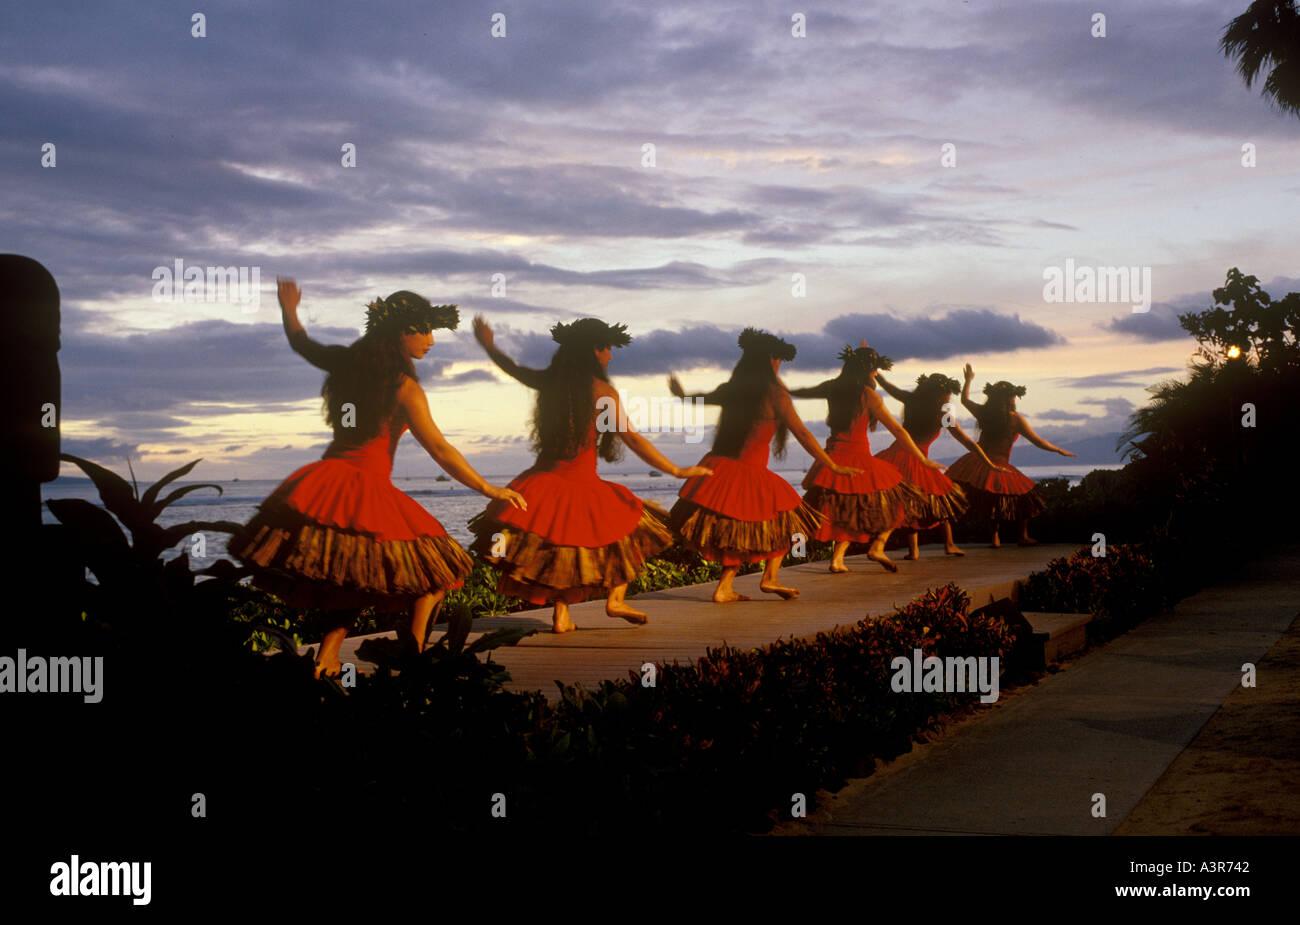 Traditional hula dancers preforming at a luau in Lahaina Maui Hawaii - Stock Image